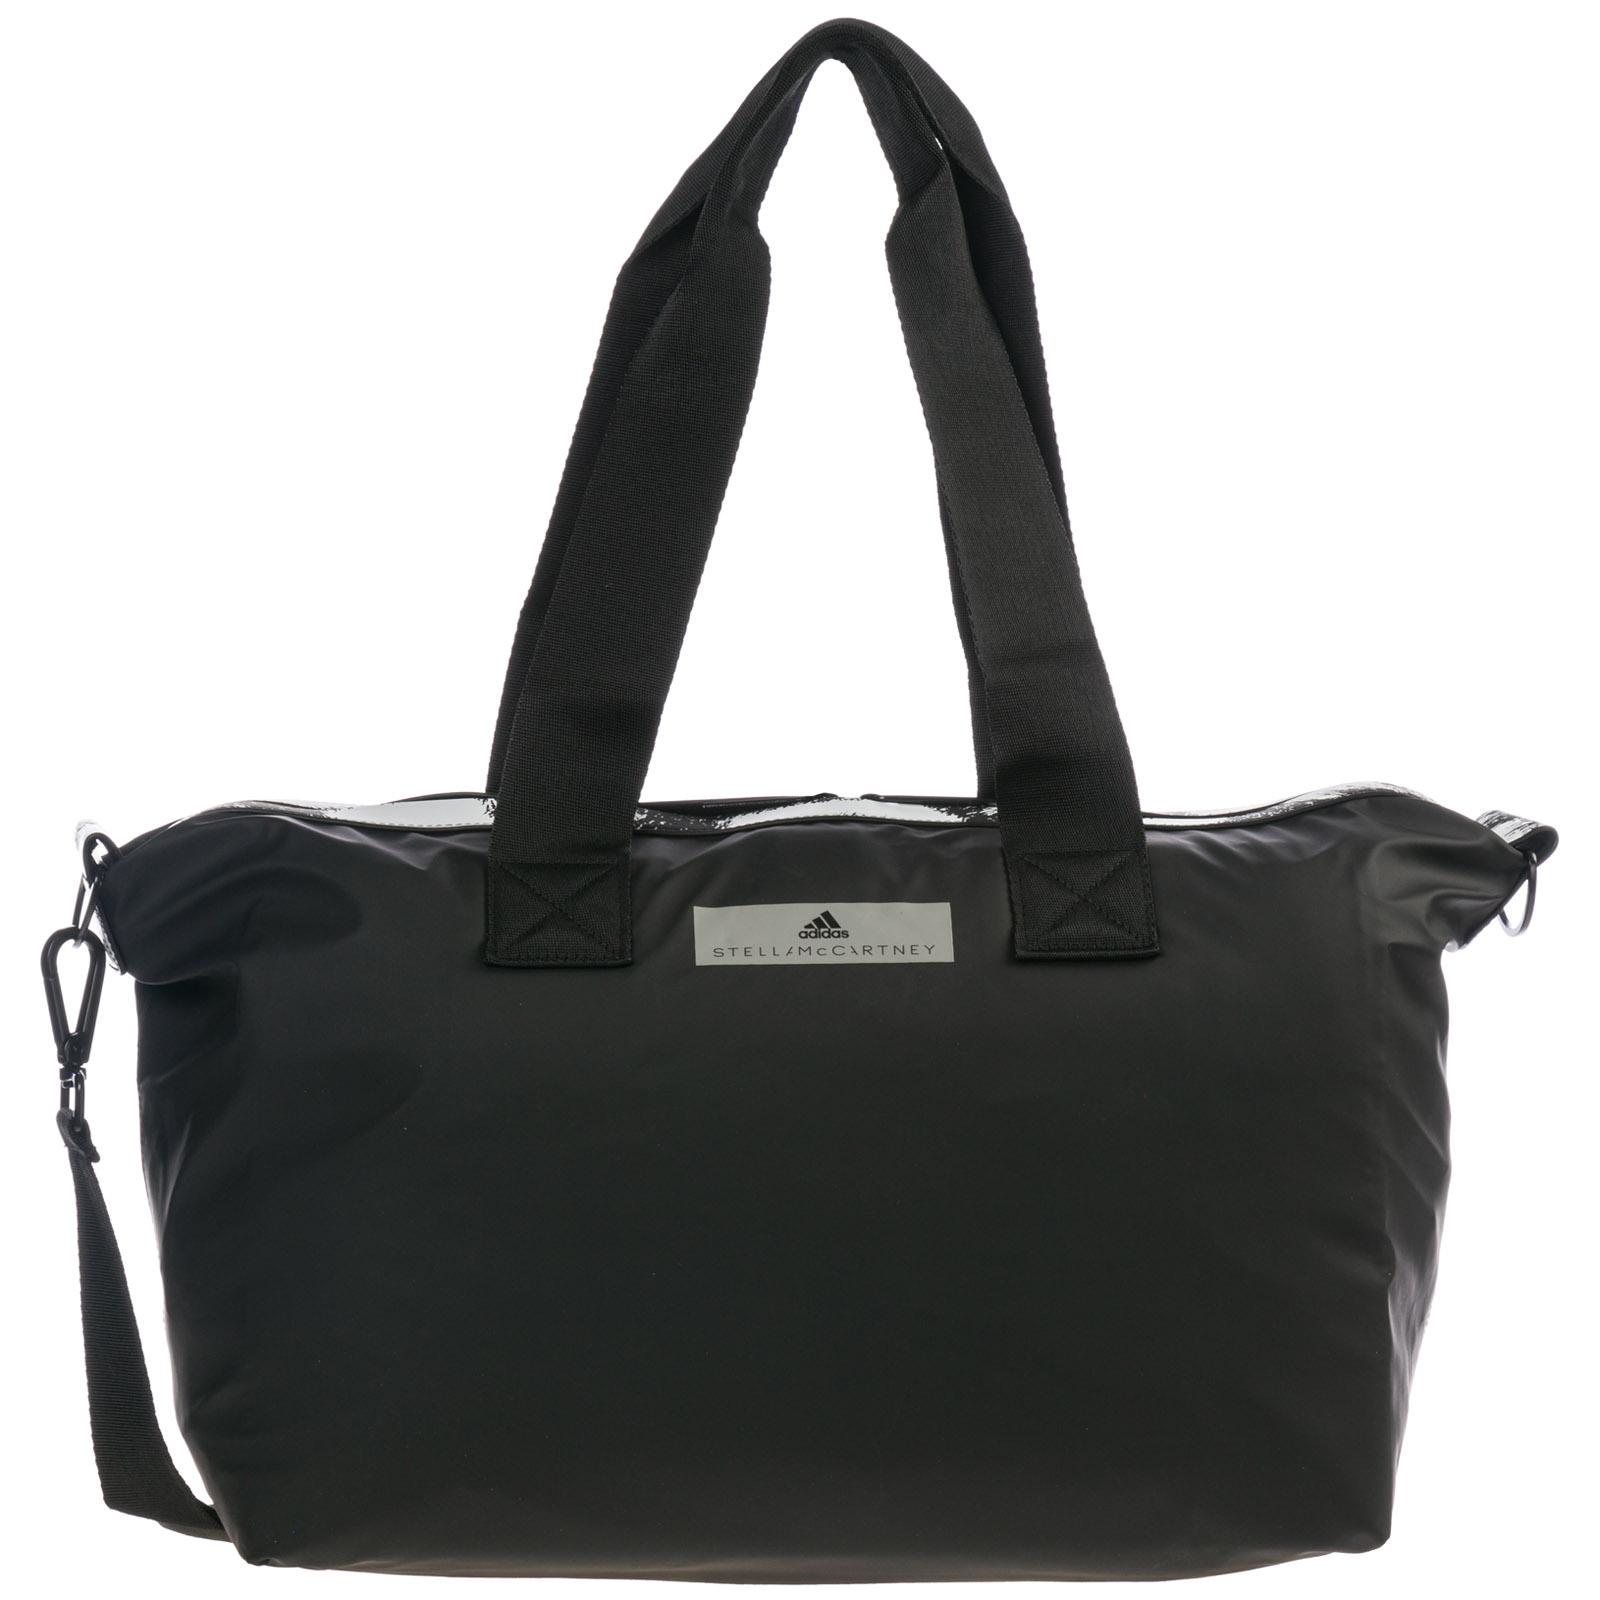 De Adidas Nero Sport Studio Bag By Stella Mccartney Dt5434 Sac wkZiuTOPX